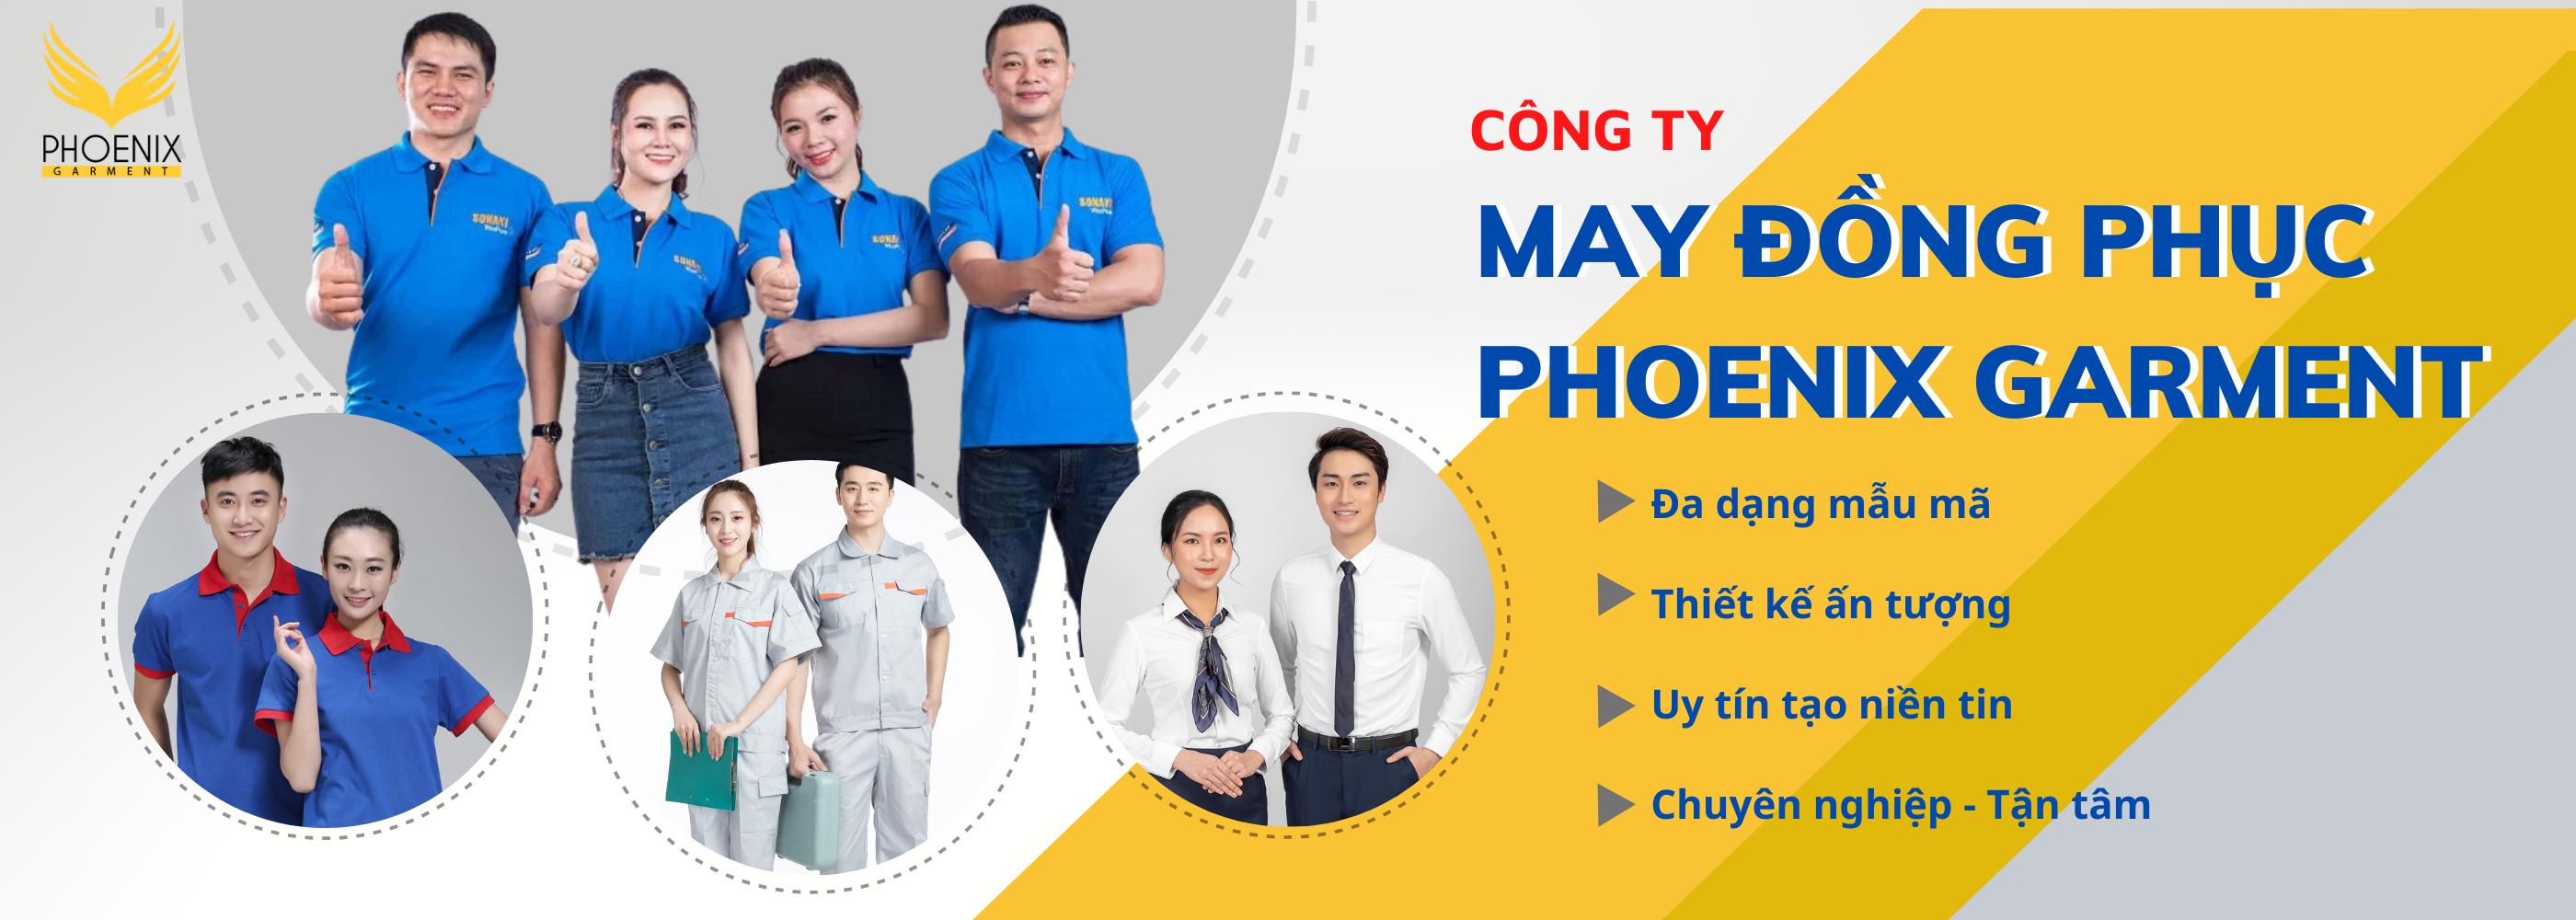 MAY ĐỒNG PHỤC PHOENIX GARENT (3)